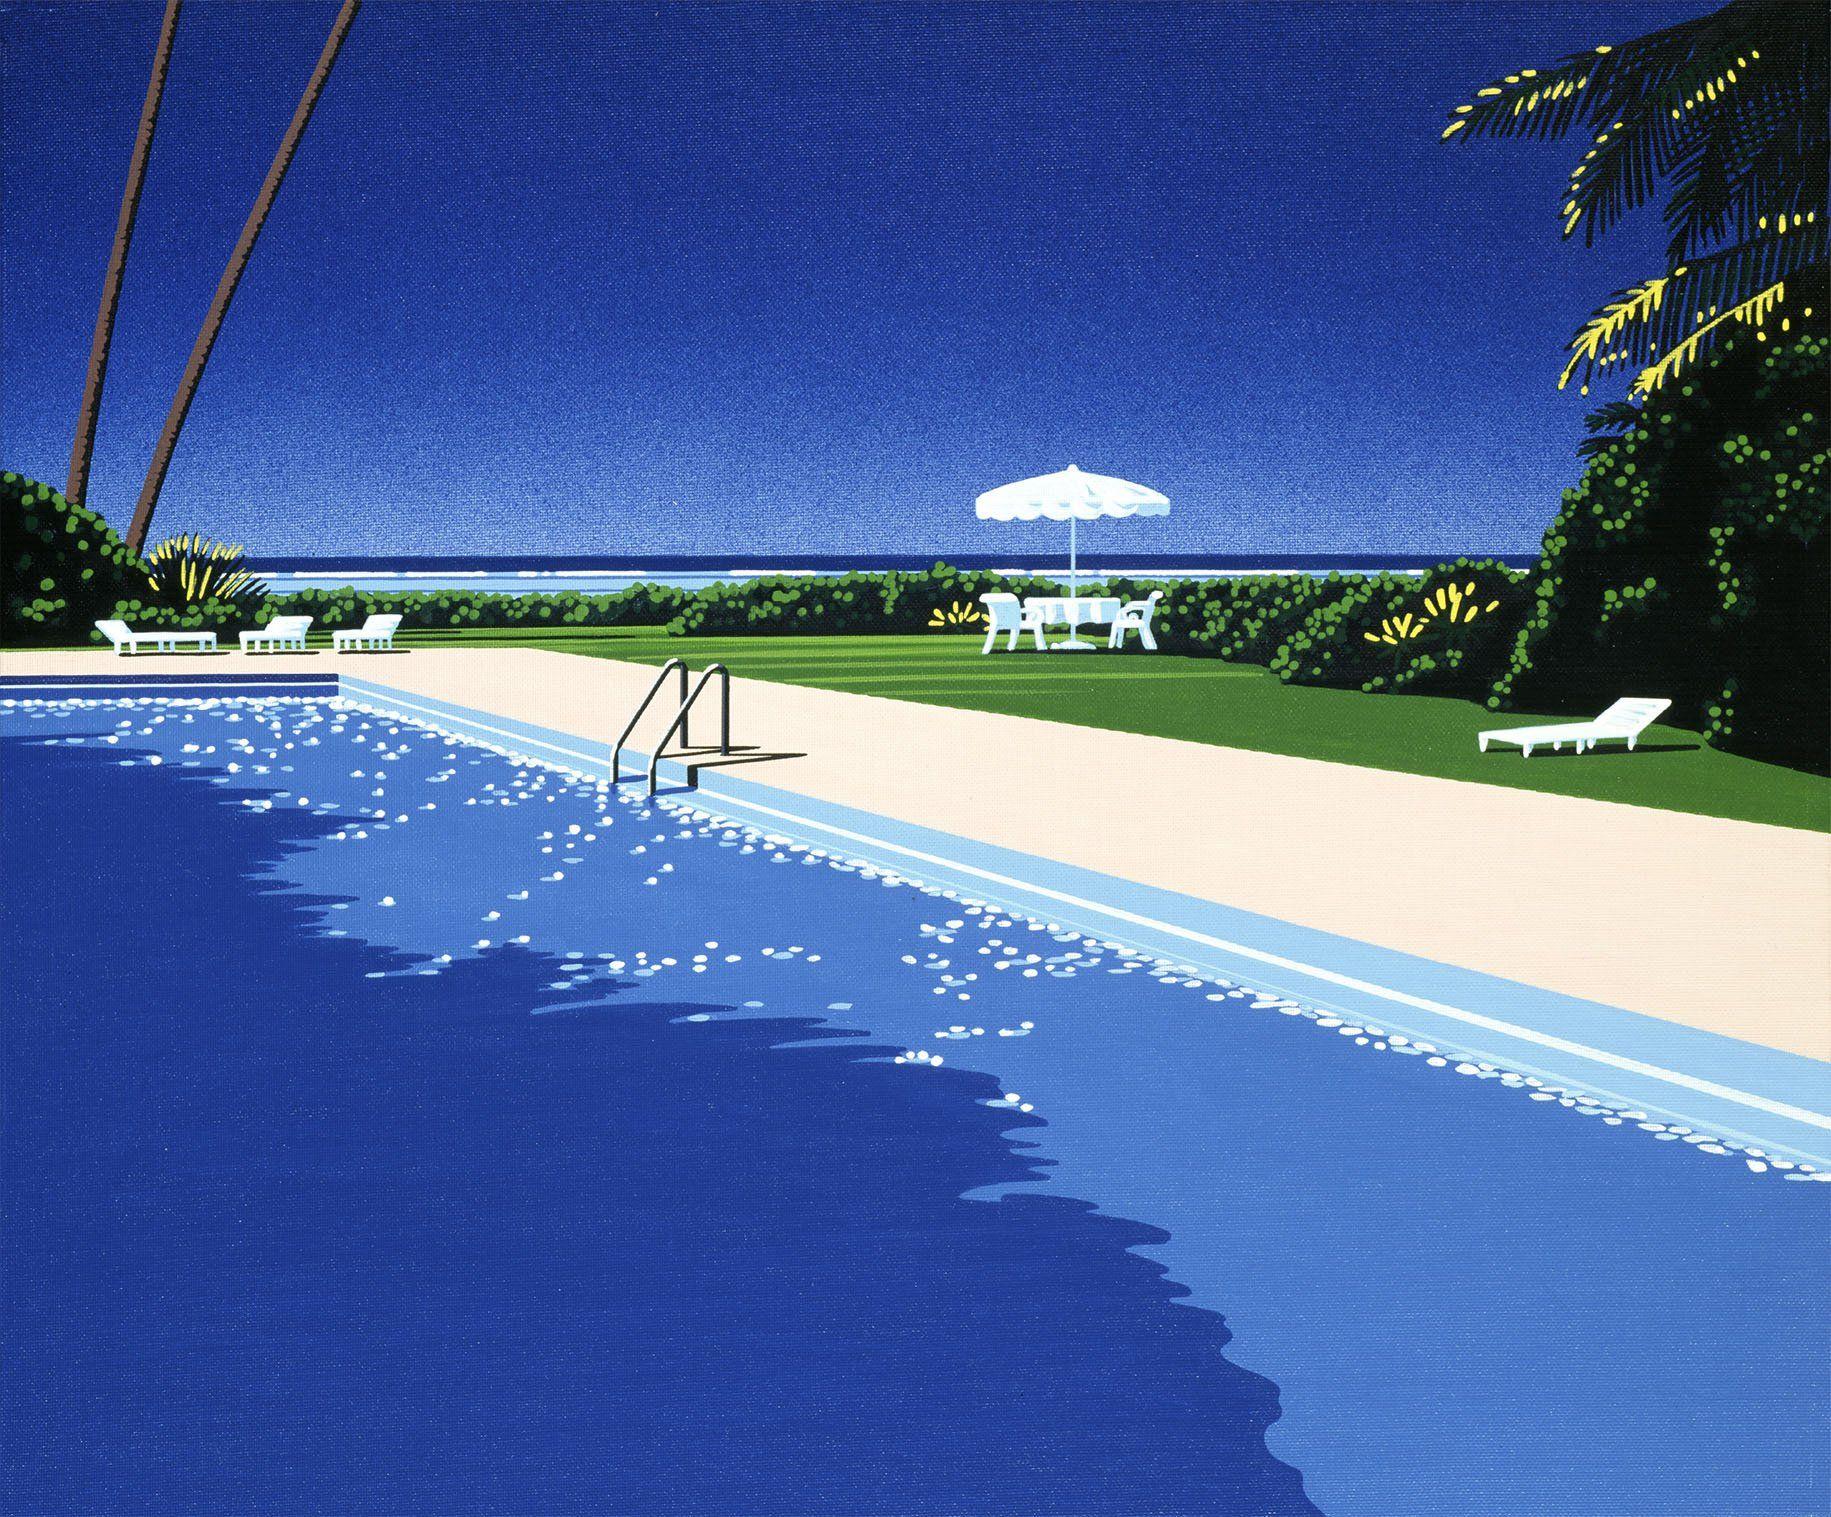 Hiroshi Nagai | Home art, Landscape, Art